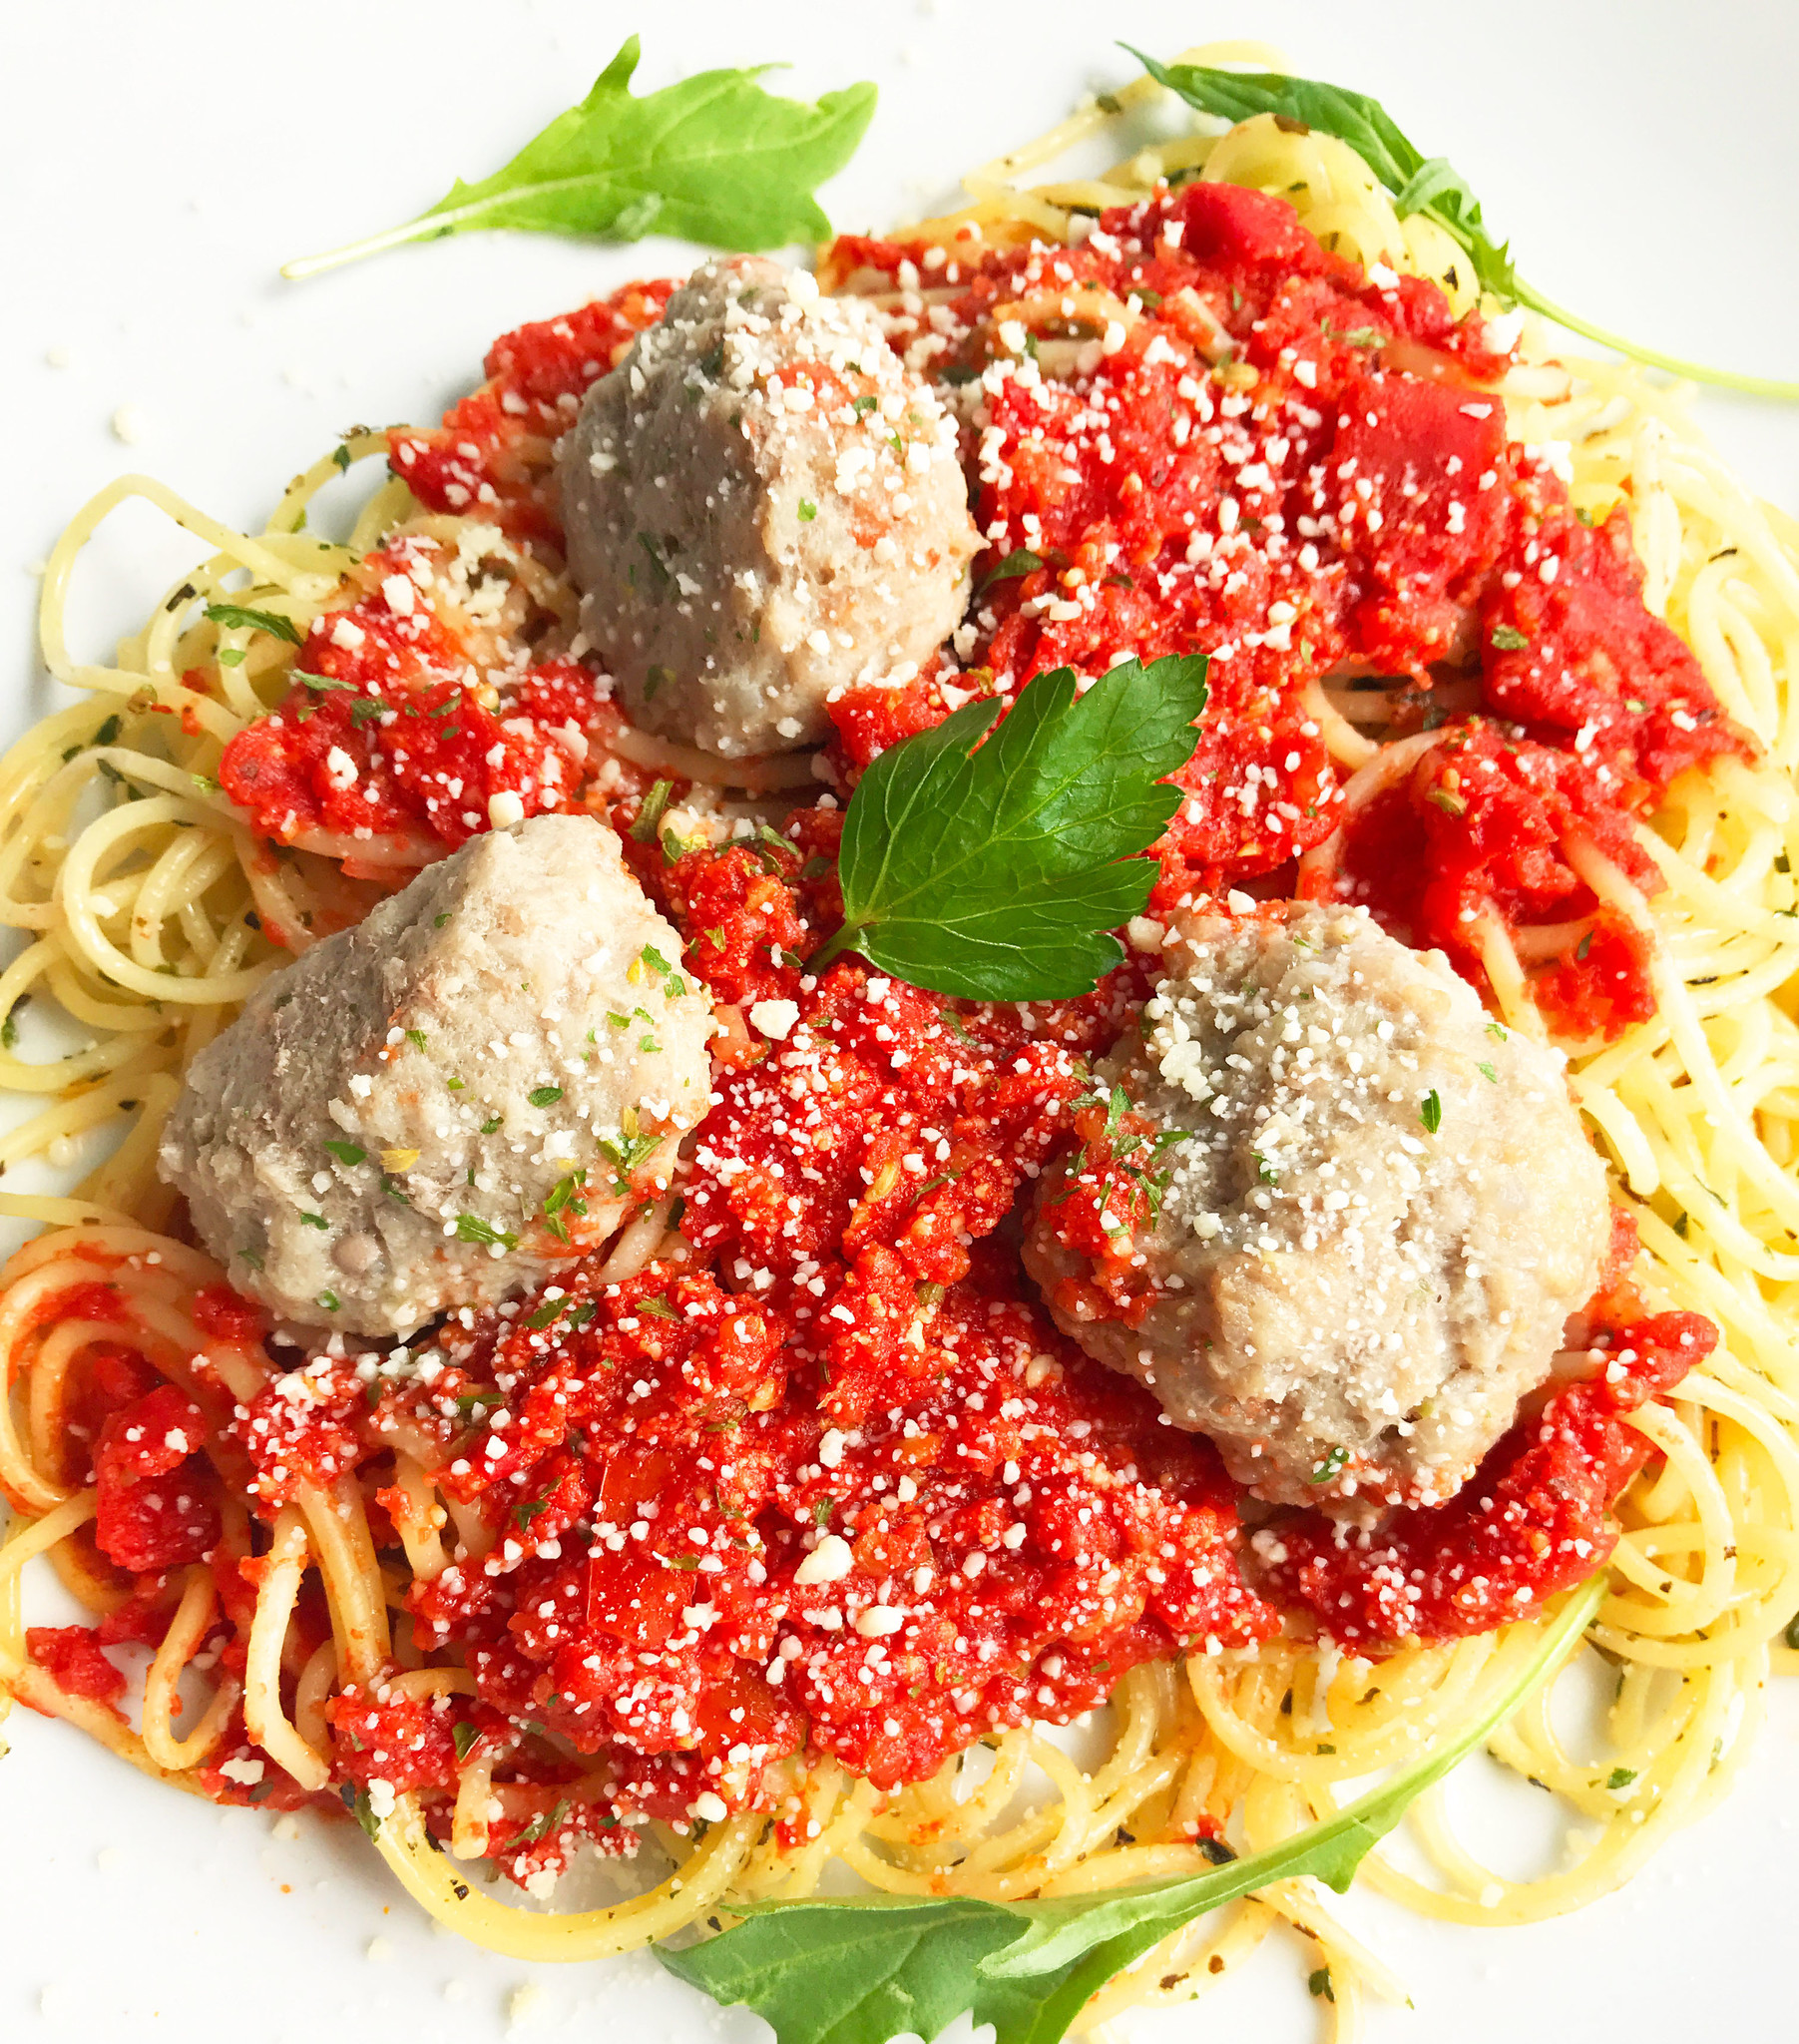 Spaghettini aux boulettes de veau, marinara & parmesan (325g)